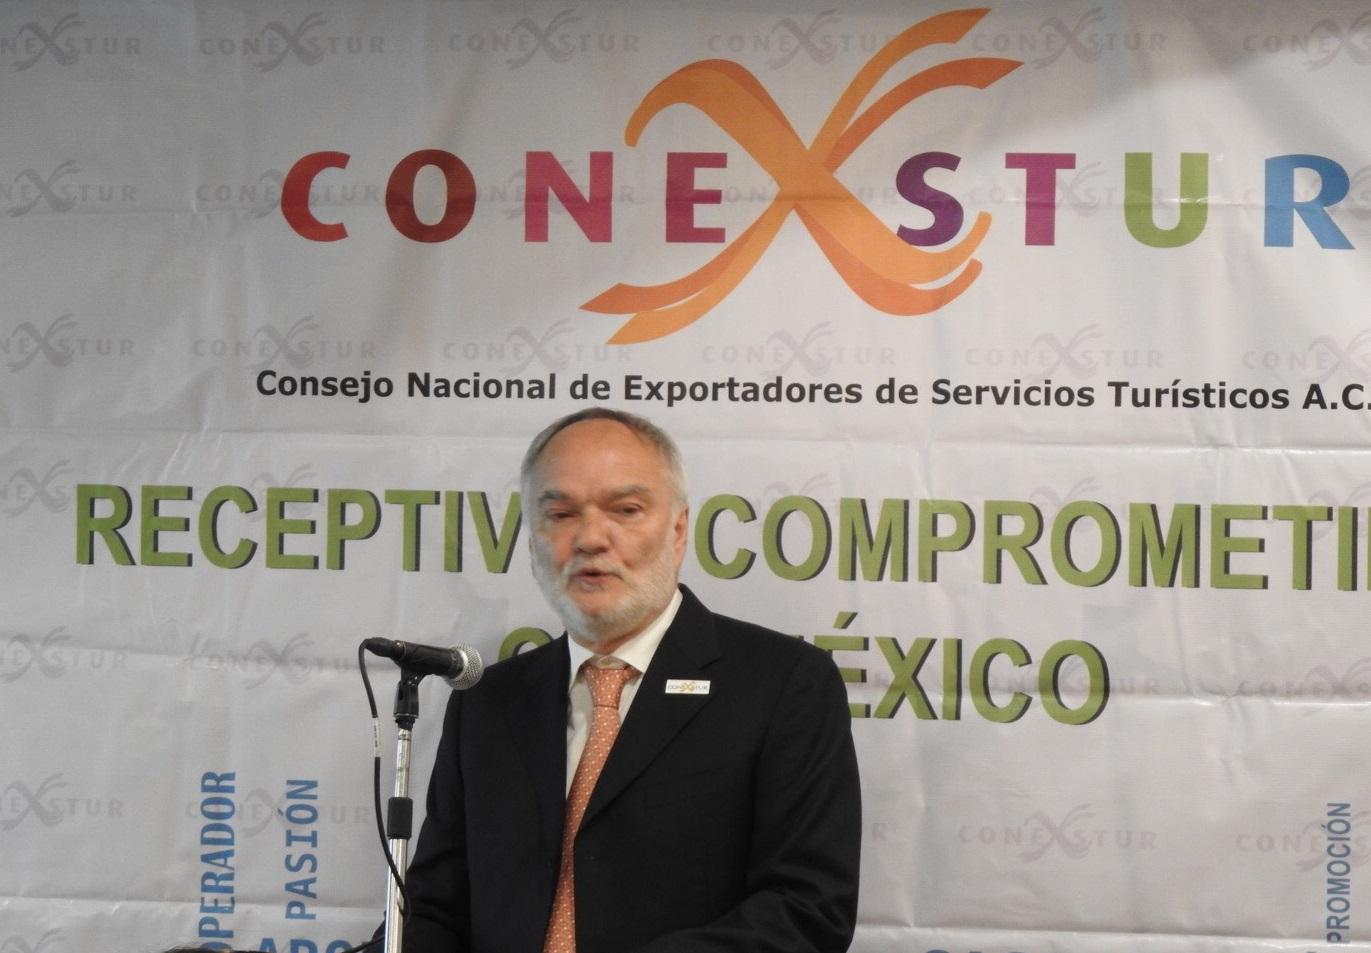 CONEXSTUR-MÉXICO-WTM-LONDRES-2